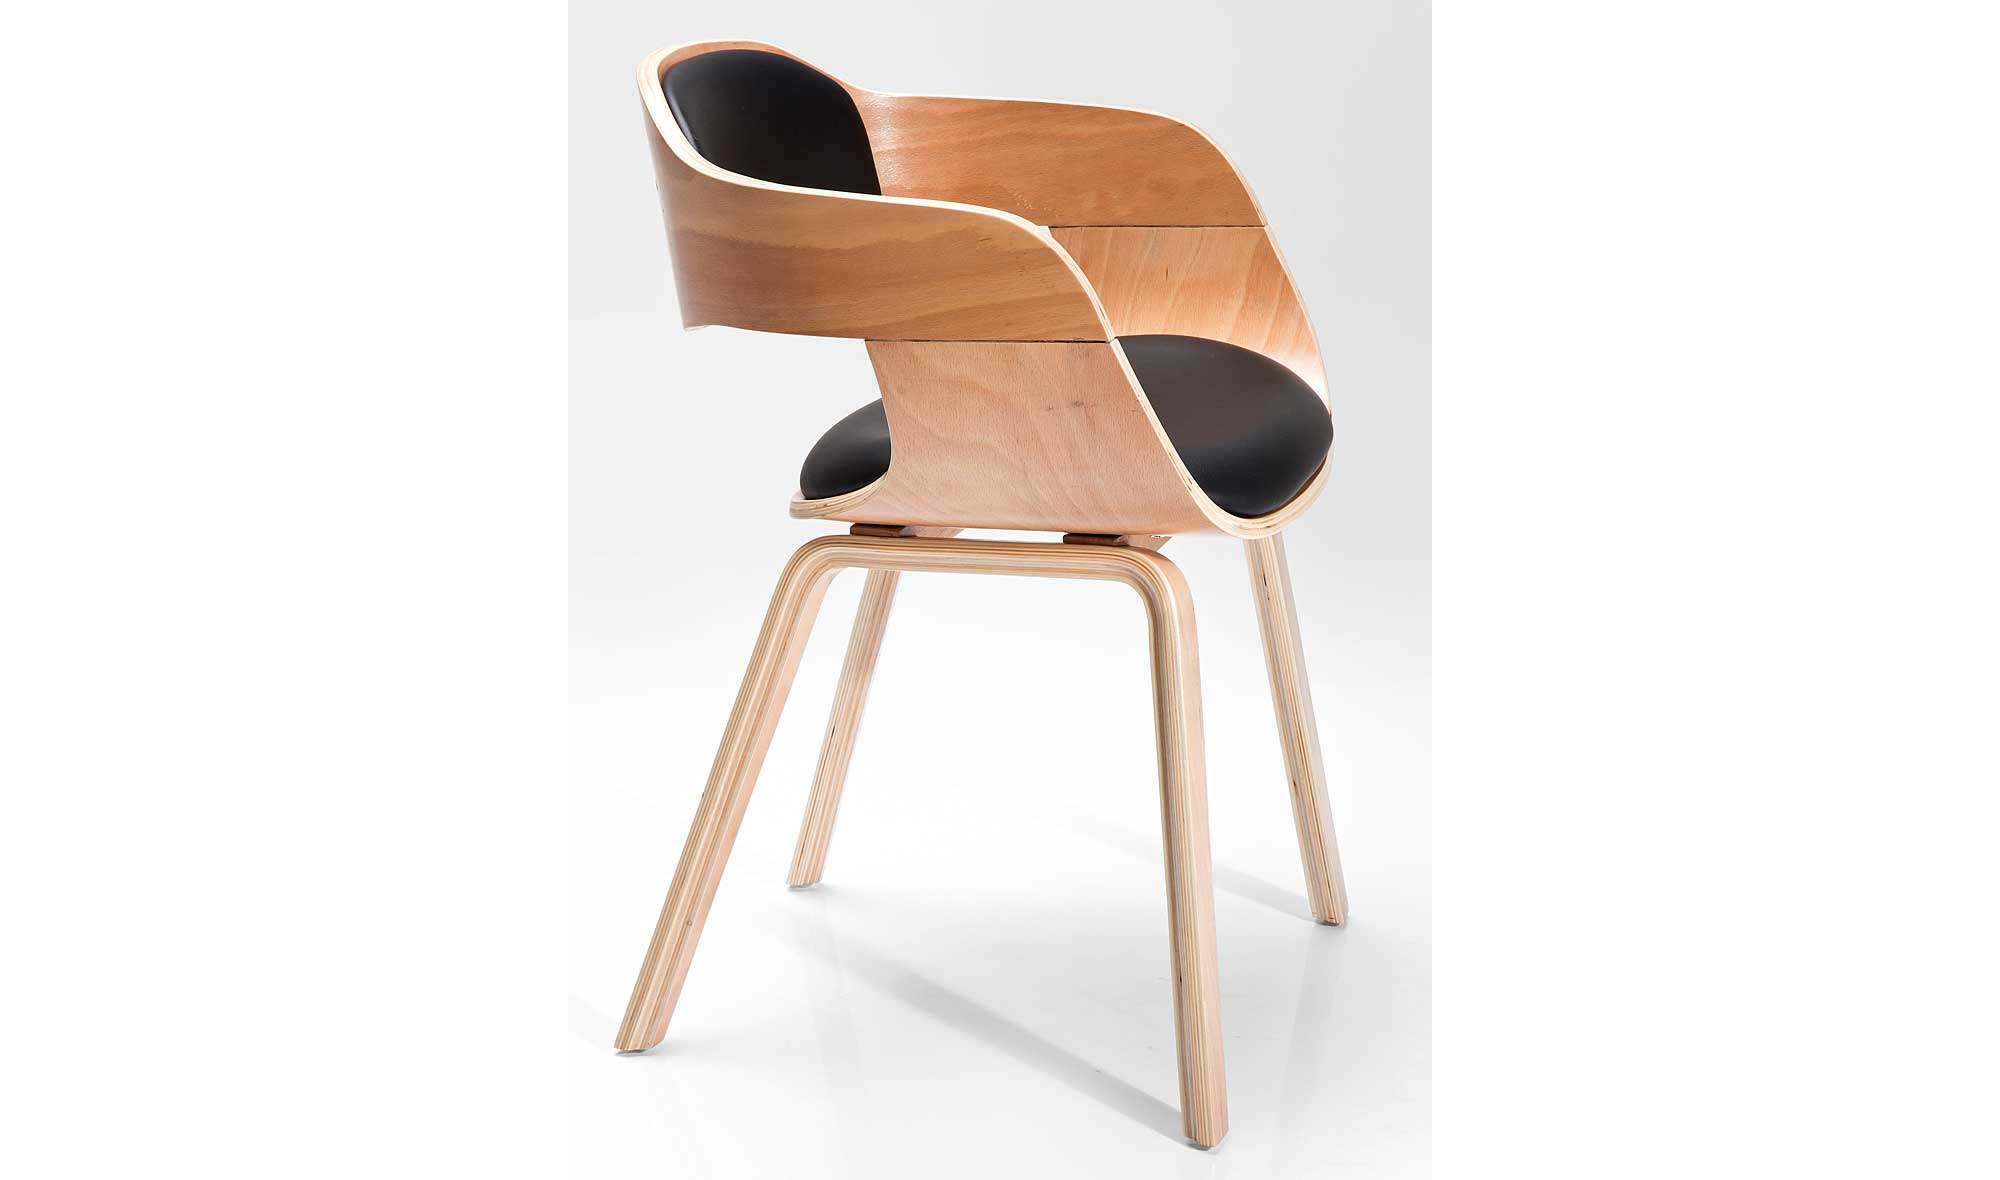 Silla moderna costa haya en cosas de arquitectoscosas de - Silla moderna diseno ...